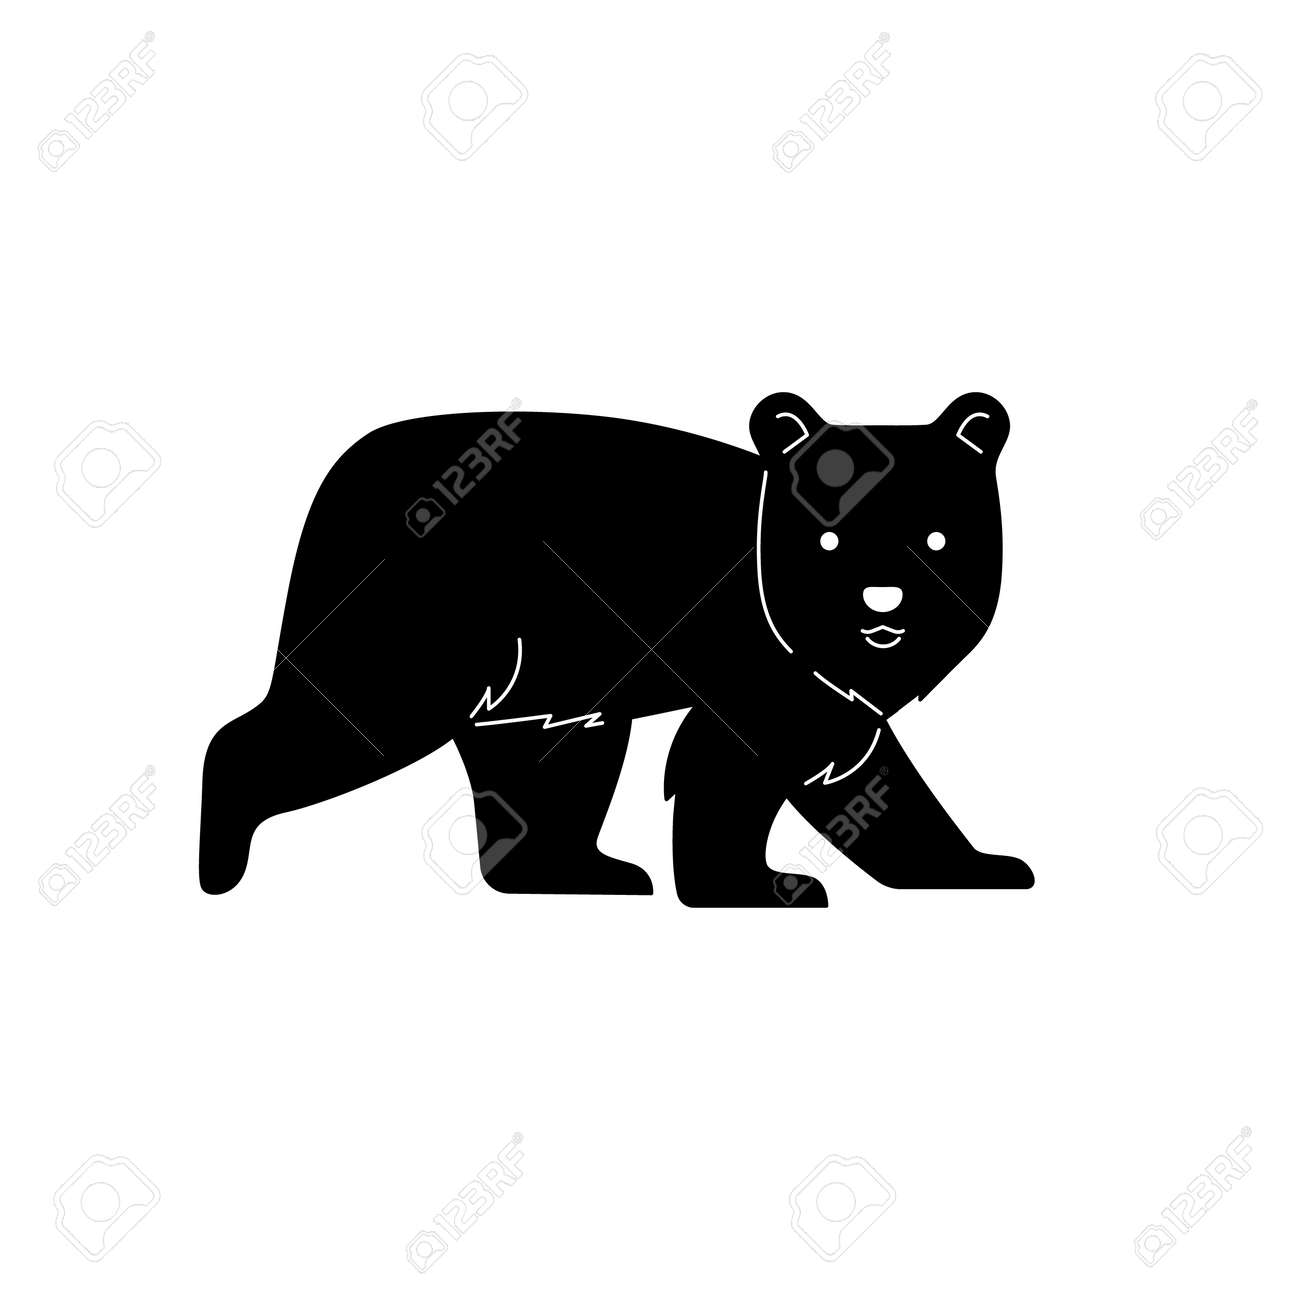 Bear graphic vector illustratipon for cutting mold. - 157901546